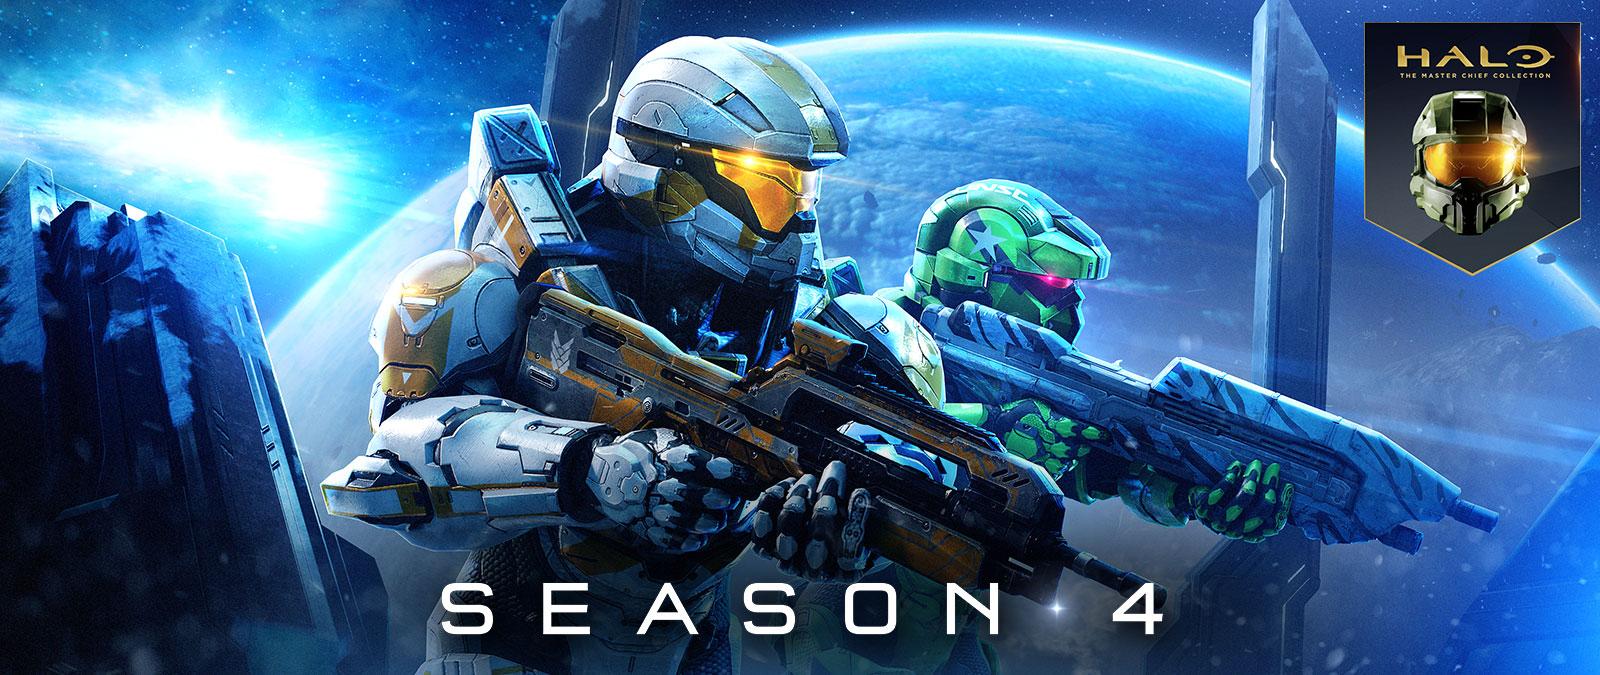 Halo: The Master Chief Collection, Season 4, Δύο Spartan στέκονται δίπλα-δίπλα έτοιμοι για μάχη, ενώ στο φόντο υπάρχει ένας μεγάλος πλανήτης.